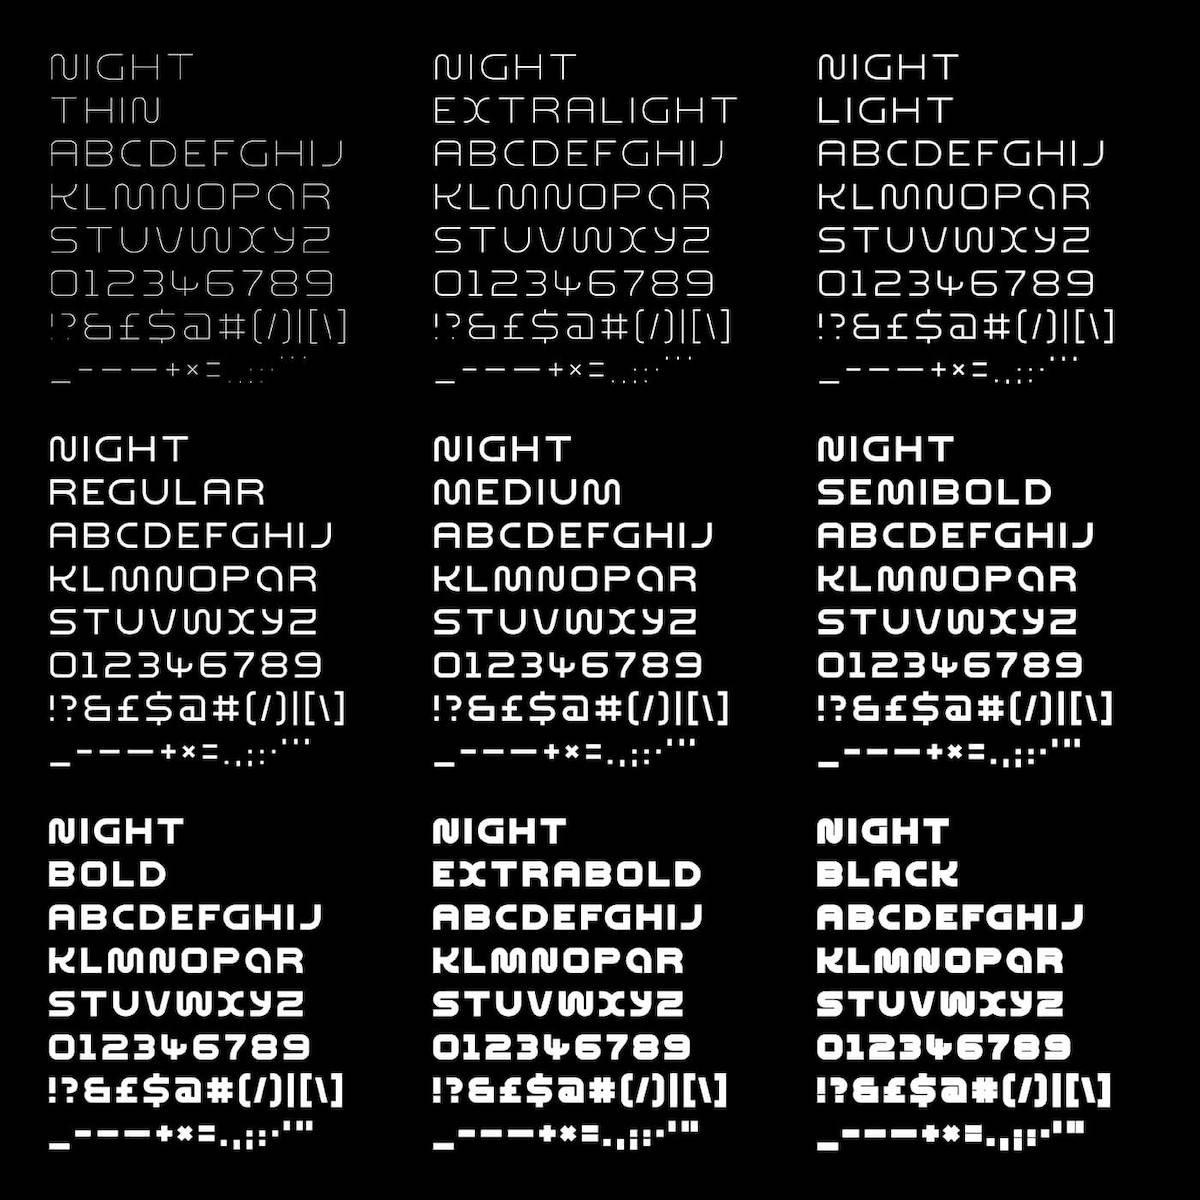 Night Variable Display Font - Nine Weights